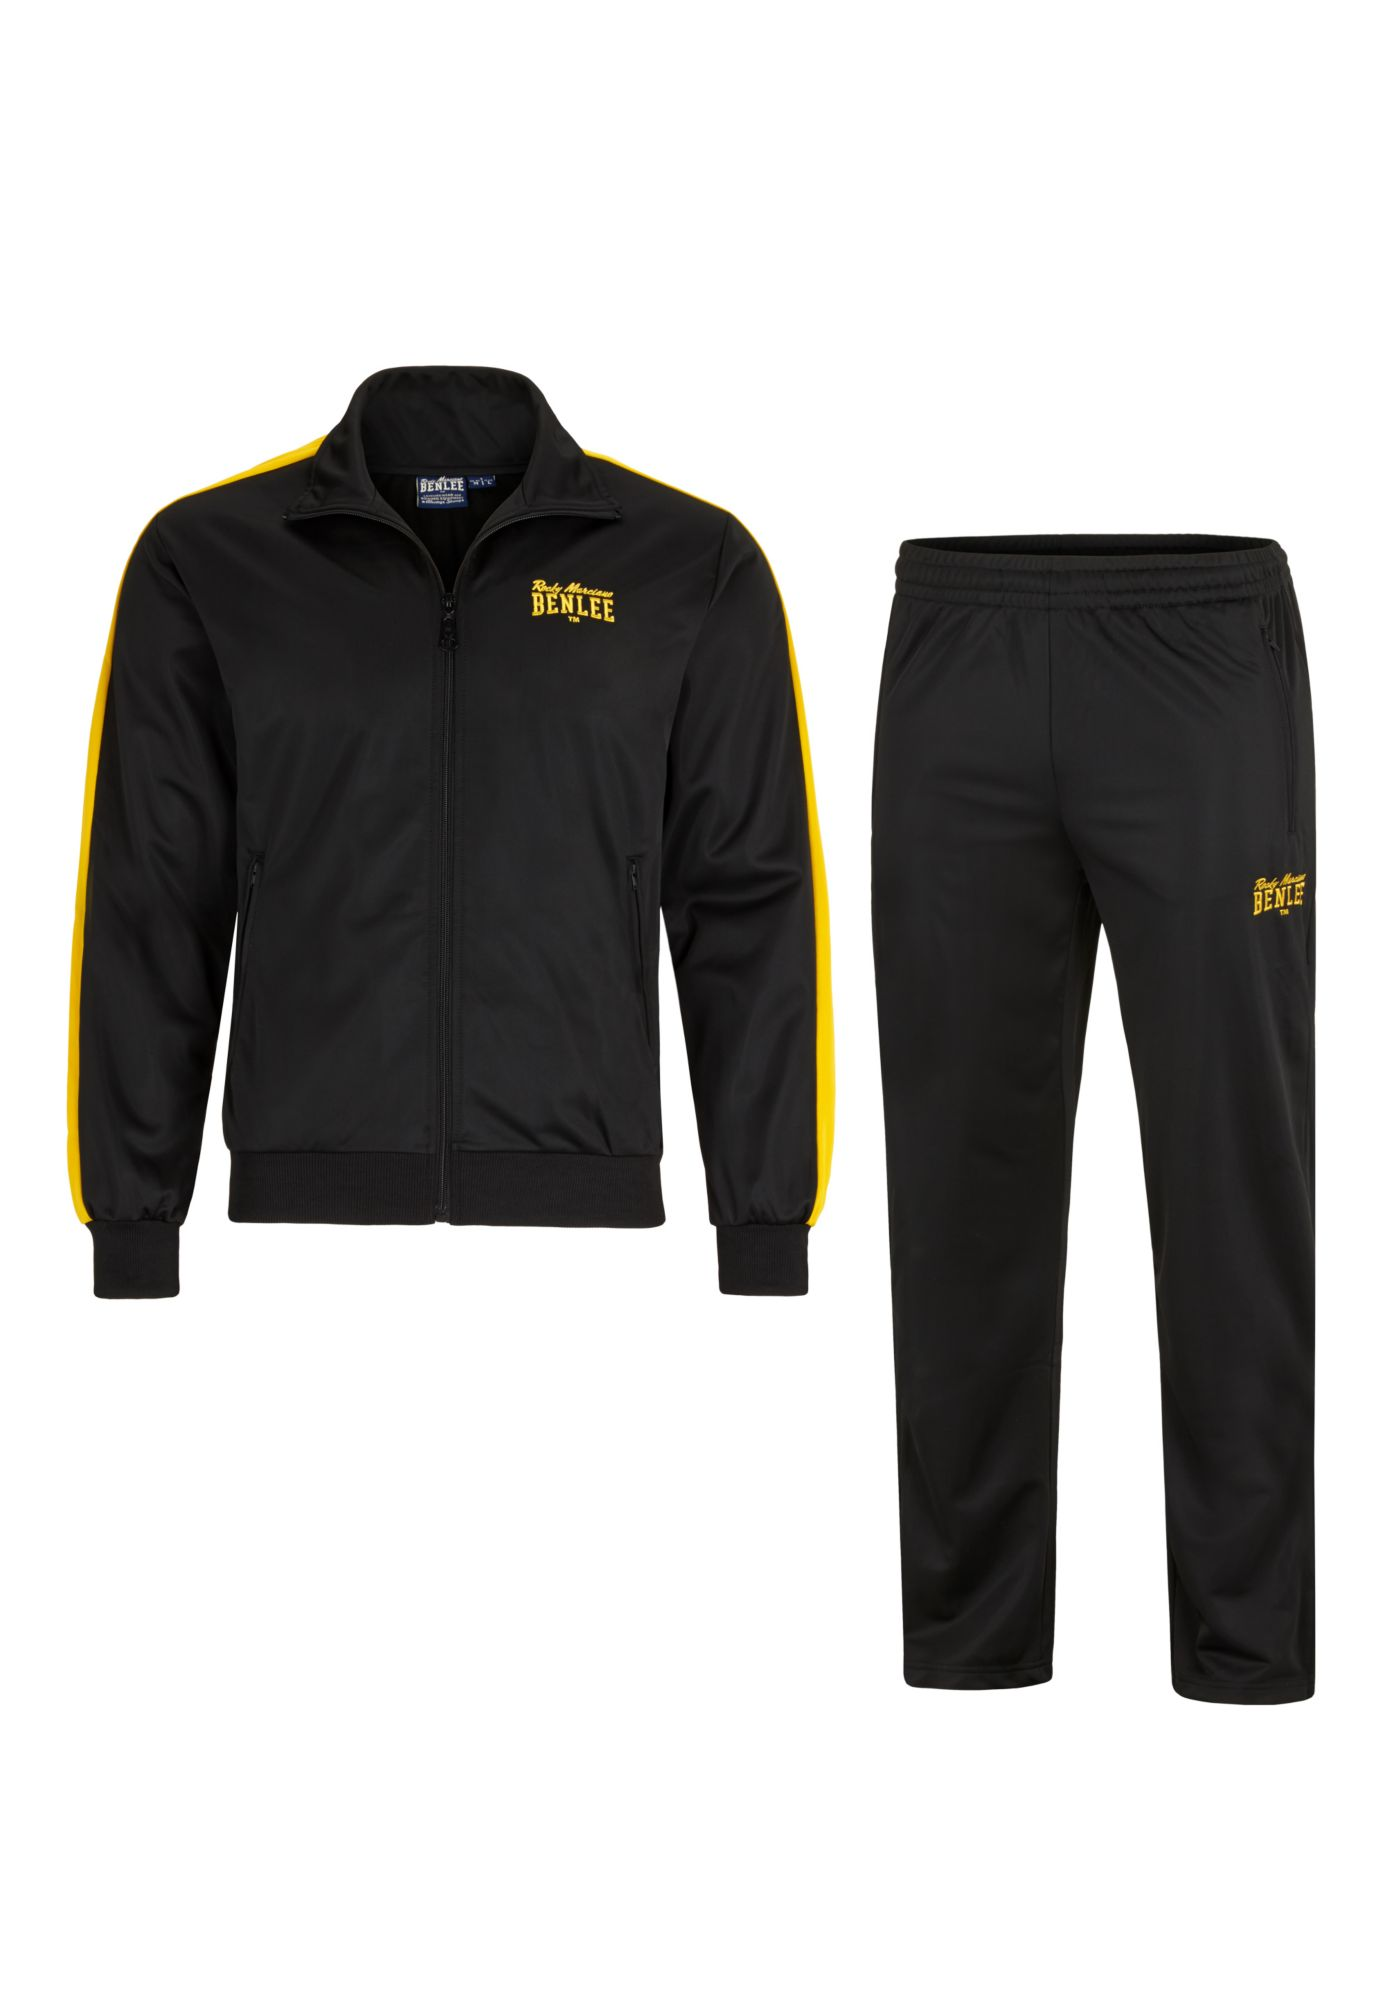 BENLEE ROCKY MARCIANO Benlee Rocky Marciano Anzug »PRESENT SUIT«